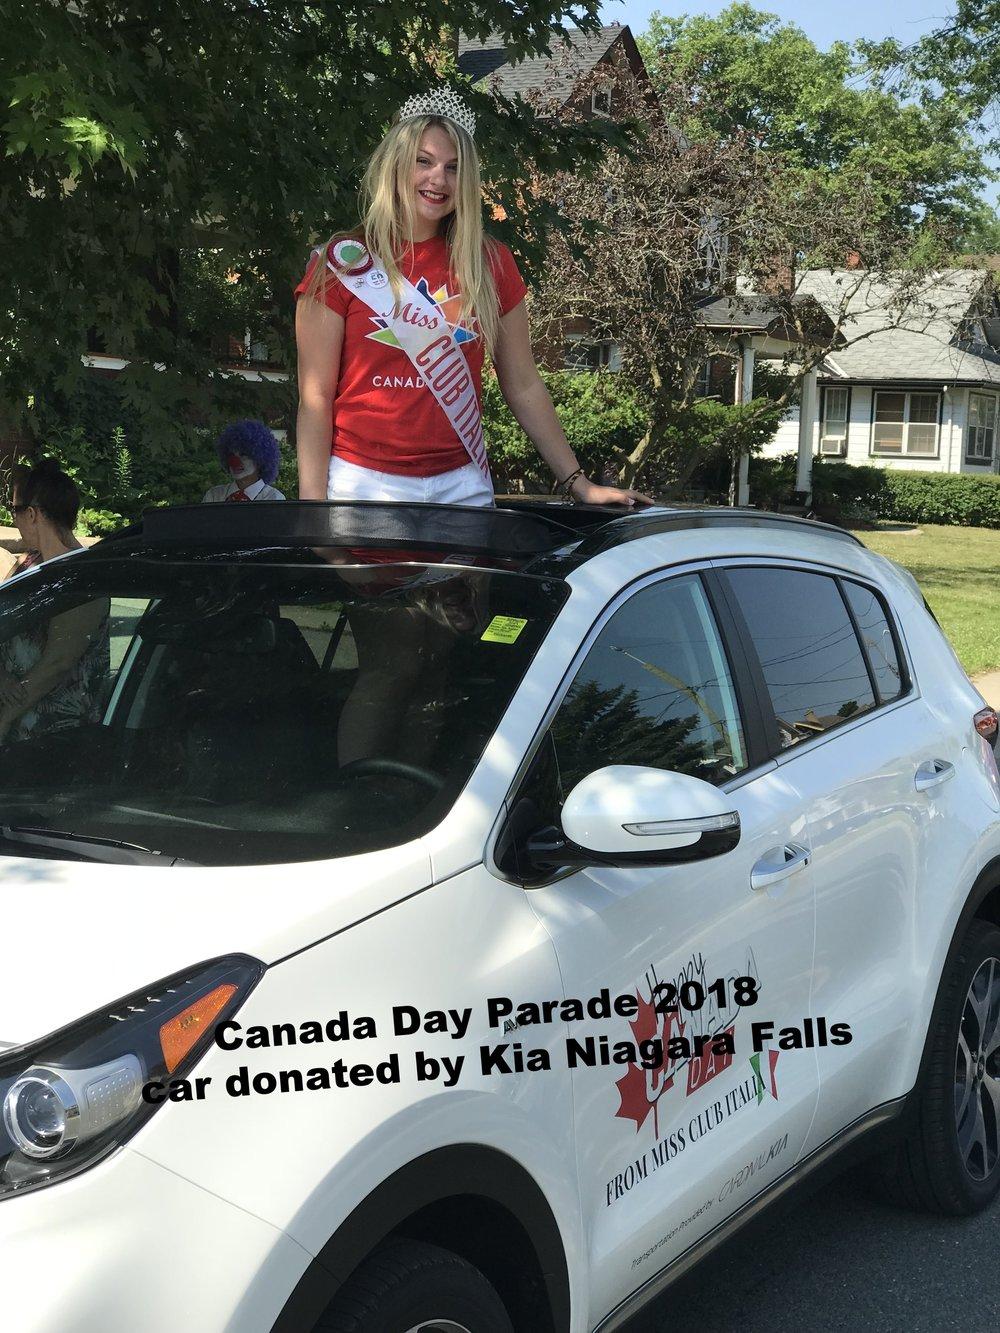 Miss Club Italia Emily Elia Canada Day Parade 2018  Car donated by:  KIA Dealership Niagara Falls